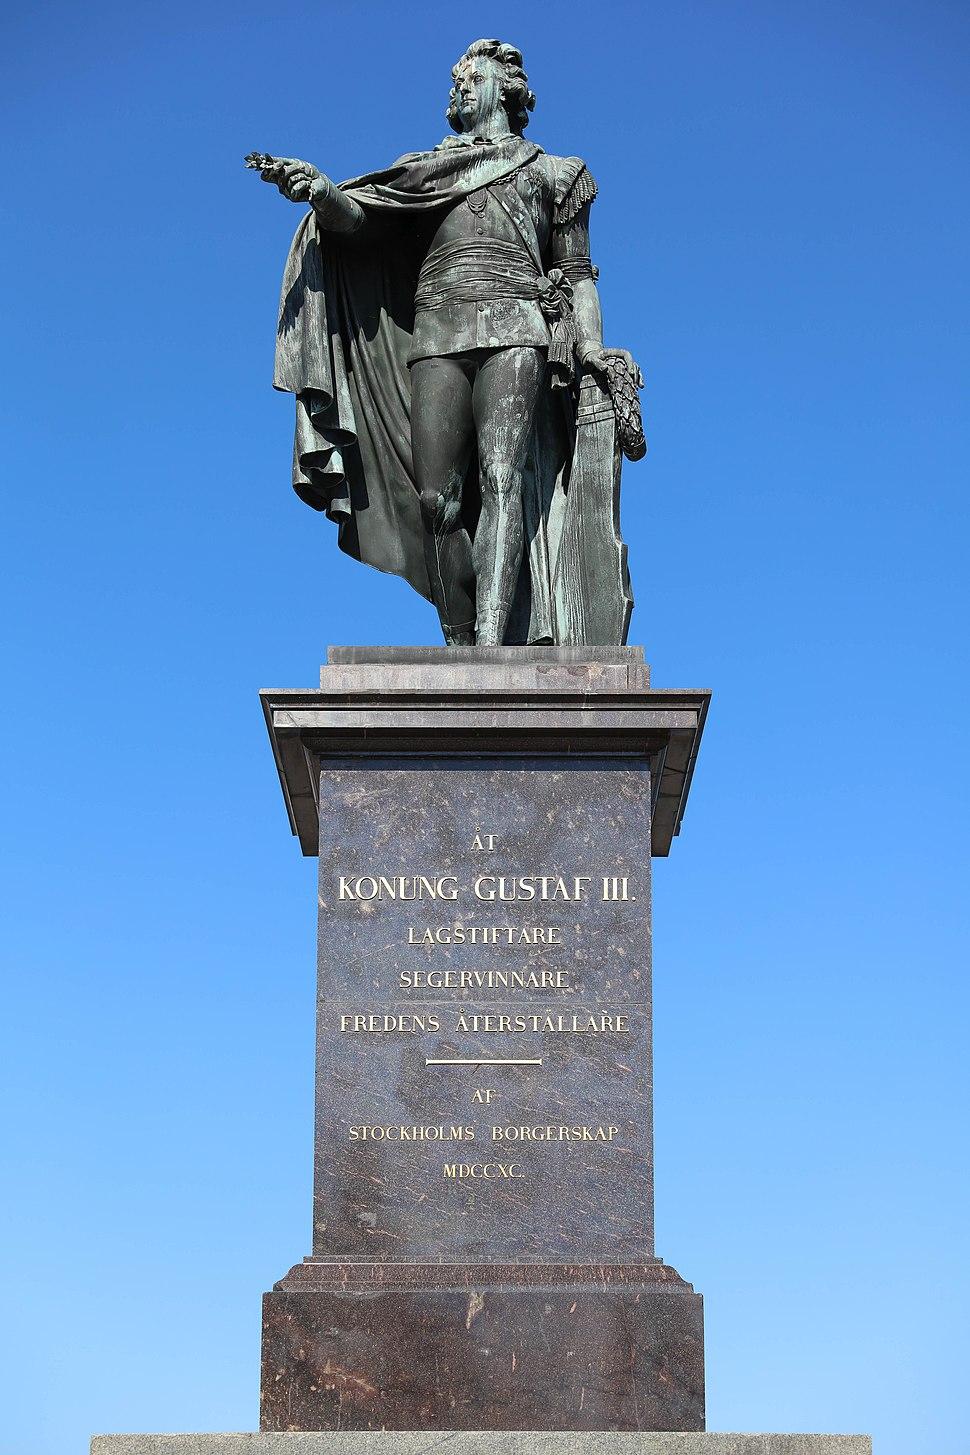 Monument to King Gustav III of Sweden (Stockholm)